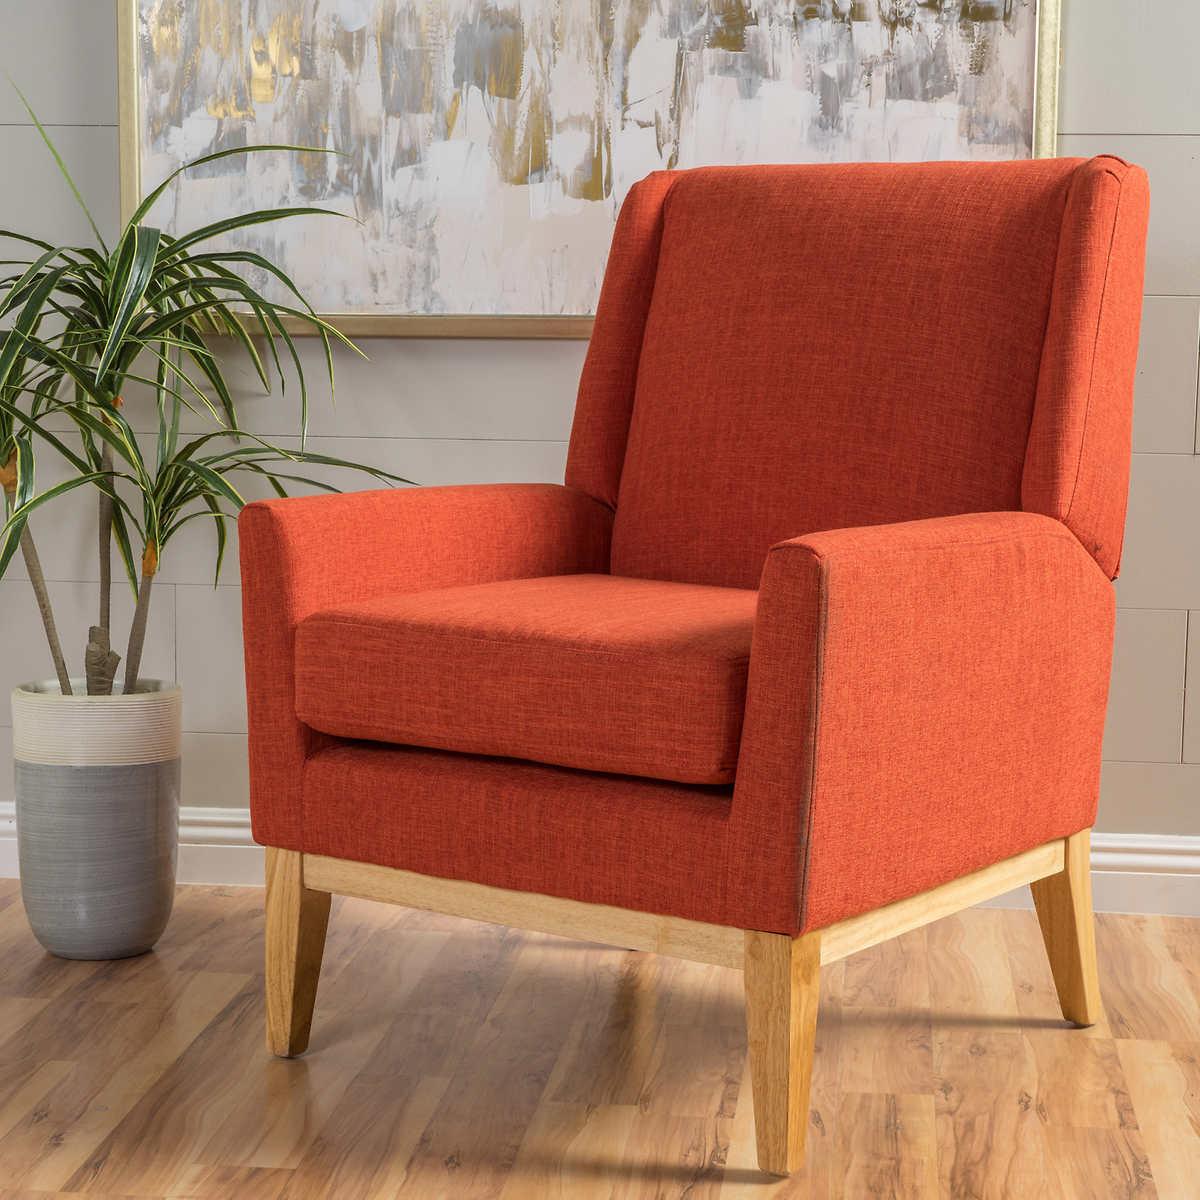 crosby fabric accent chair orange - crosby fabric accent chair orange item  click to zoom